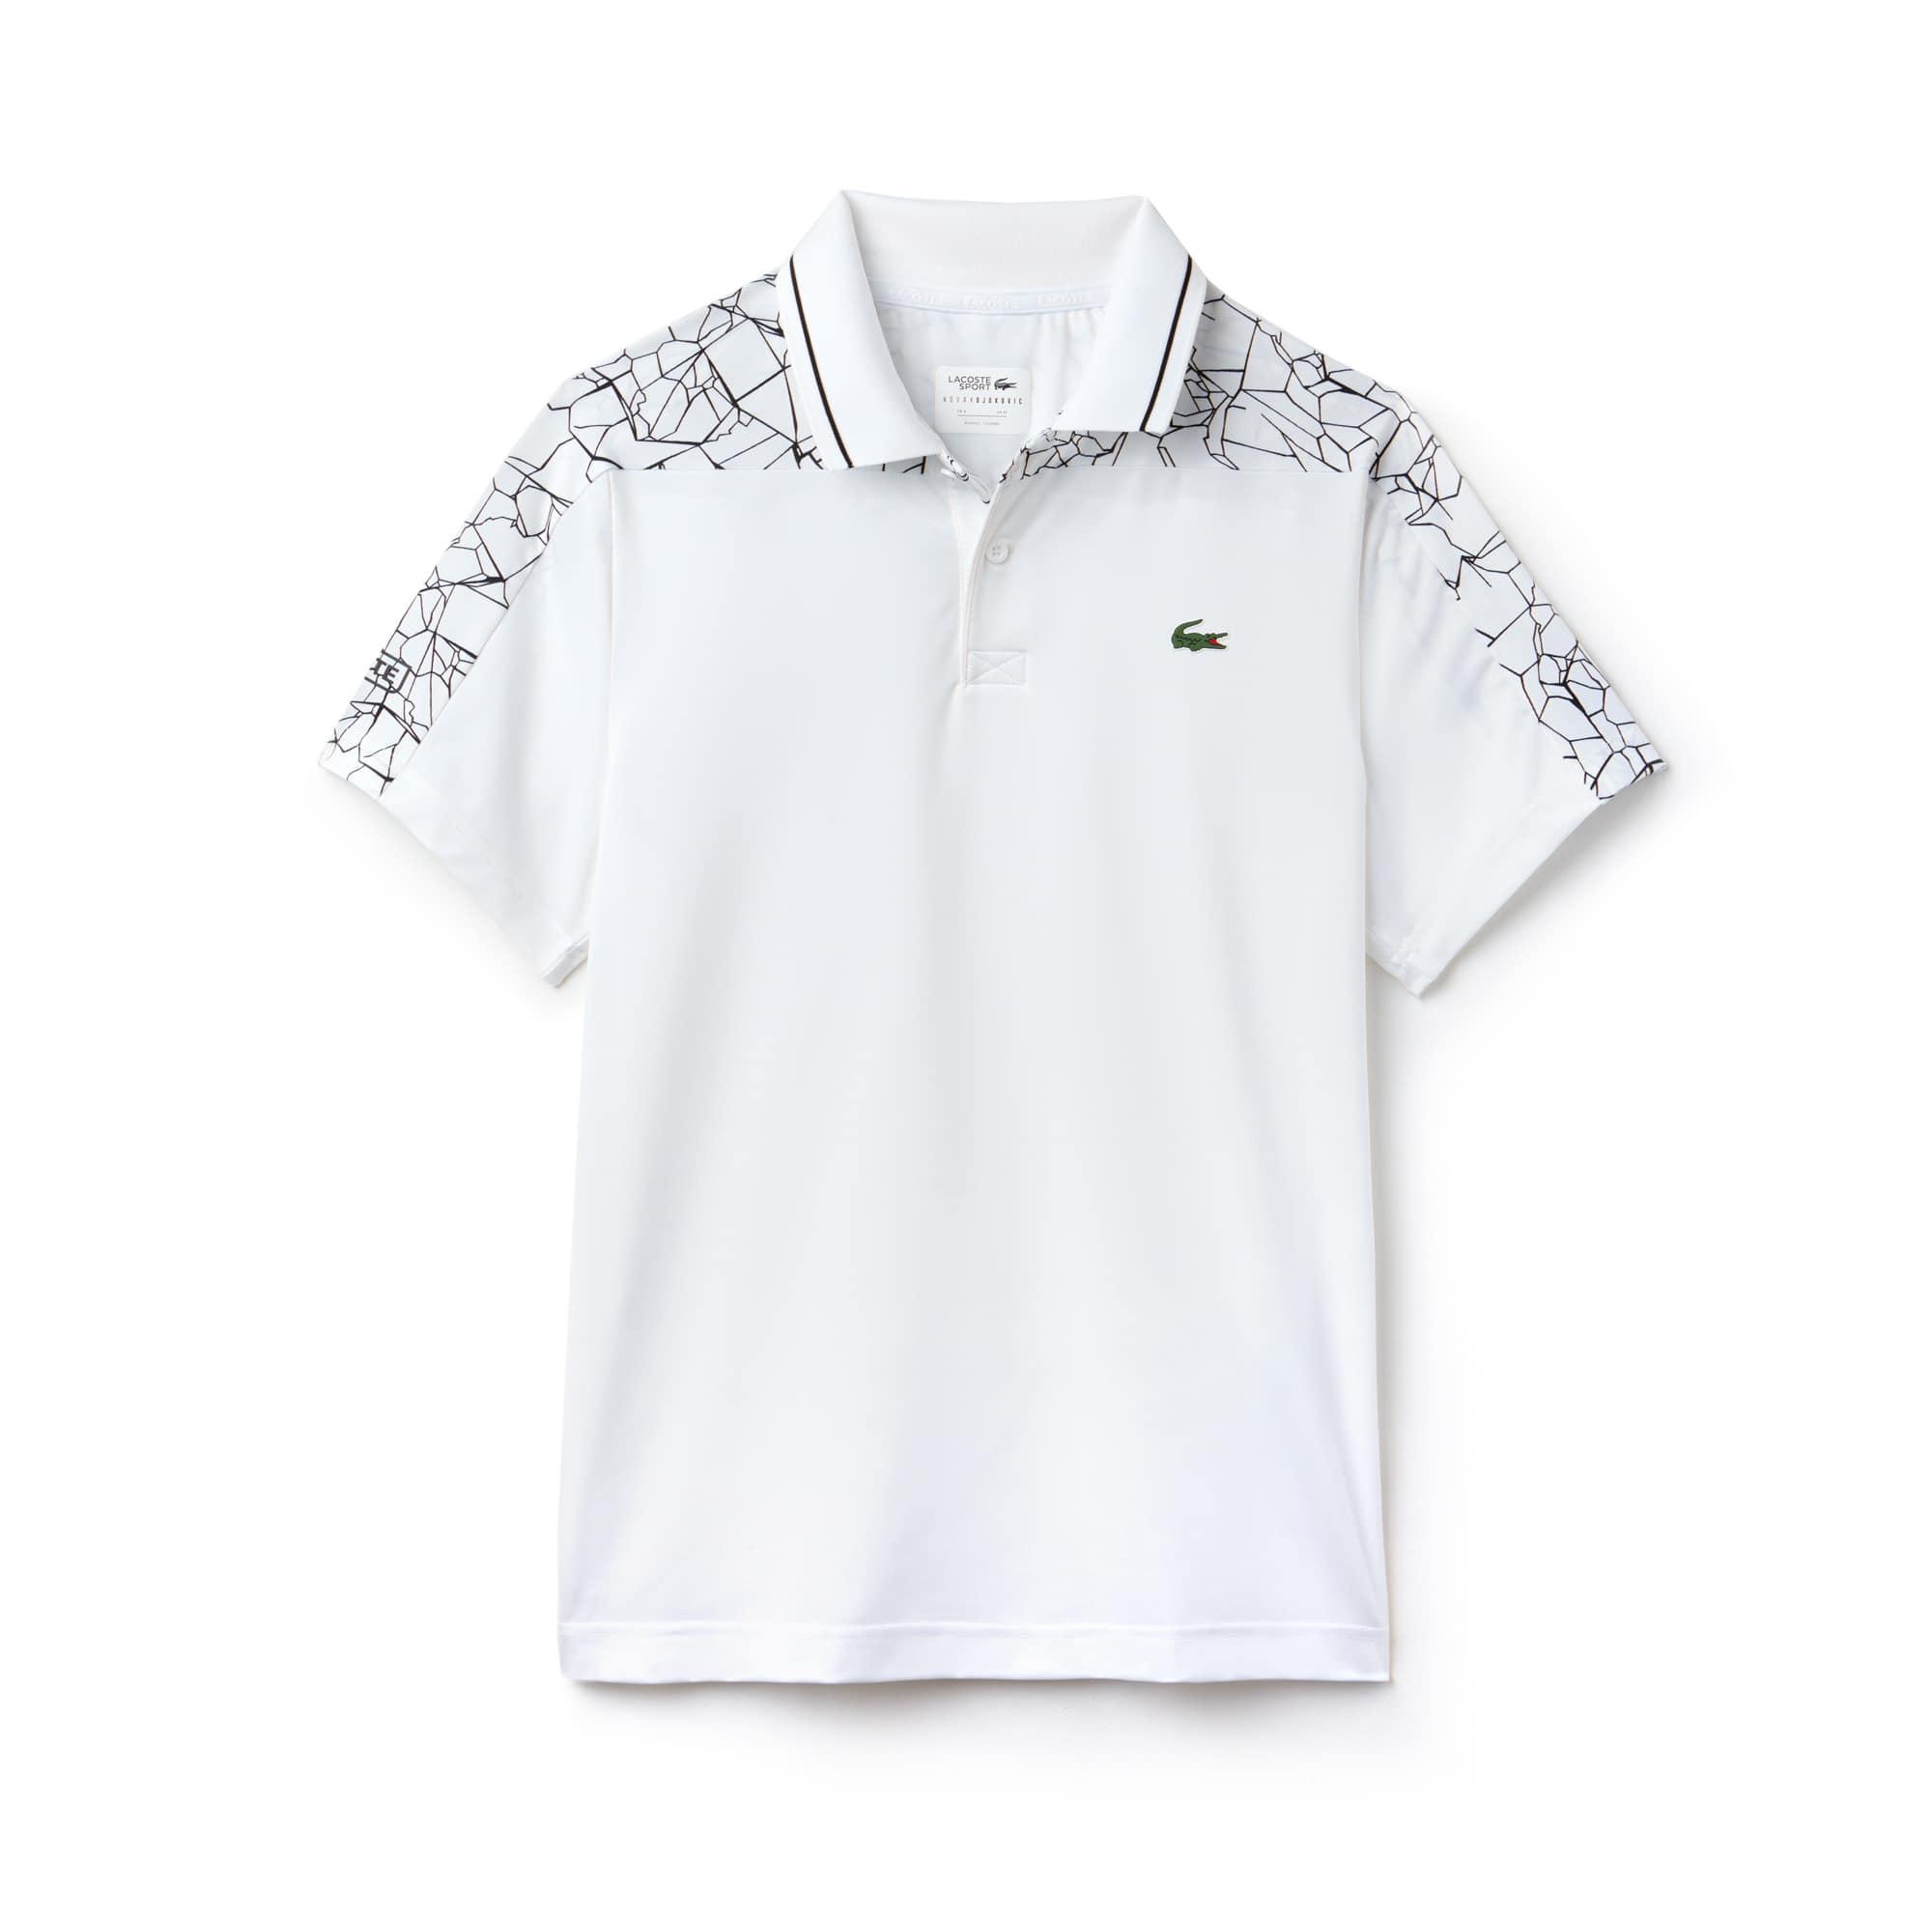 On Men's Lacoste Stretch Djokovic Sport Court Novak Collection ROAqwP